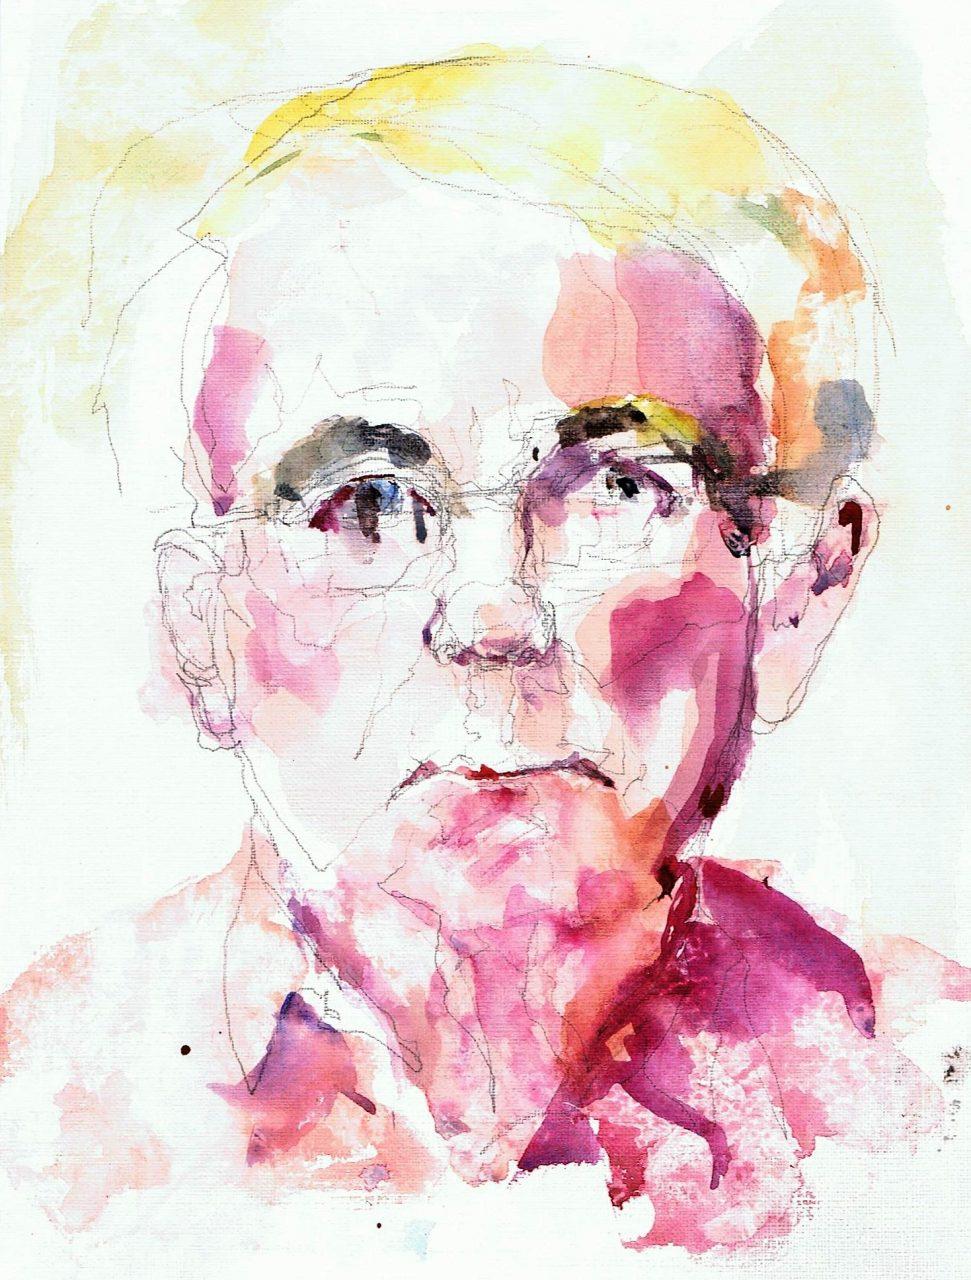 365 dagen een portret Wiegert, model Aquarel 19c25